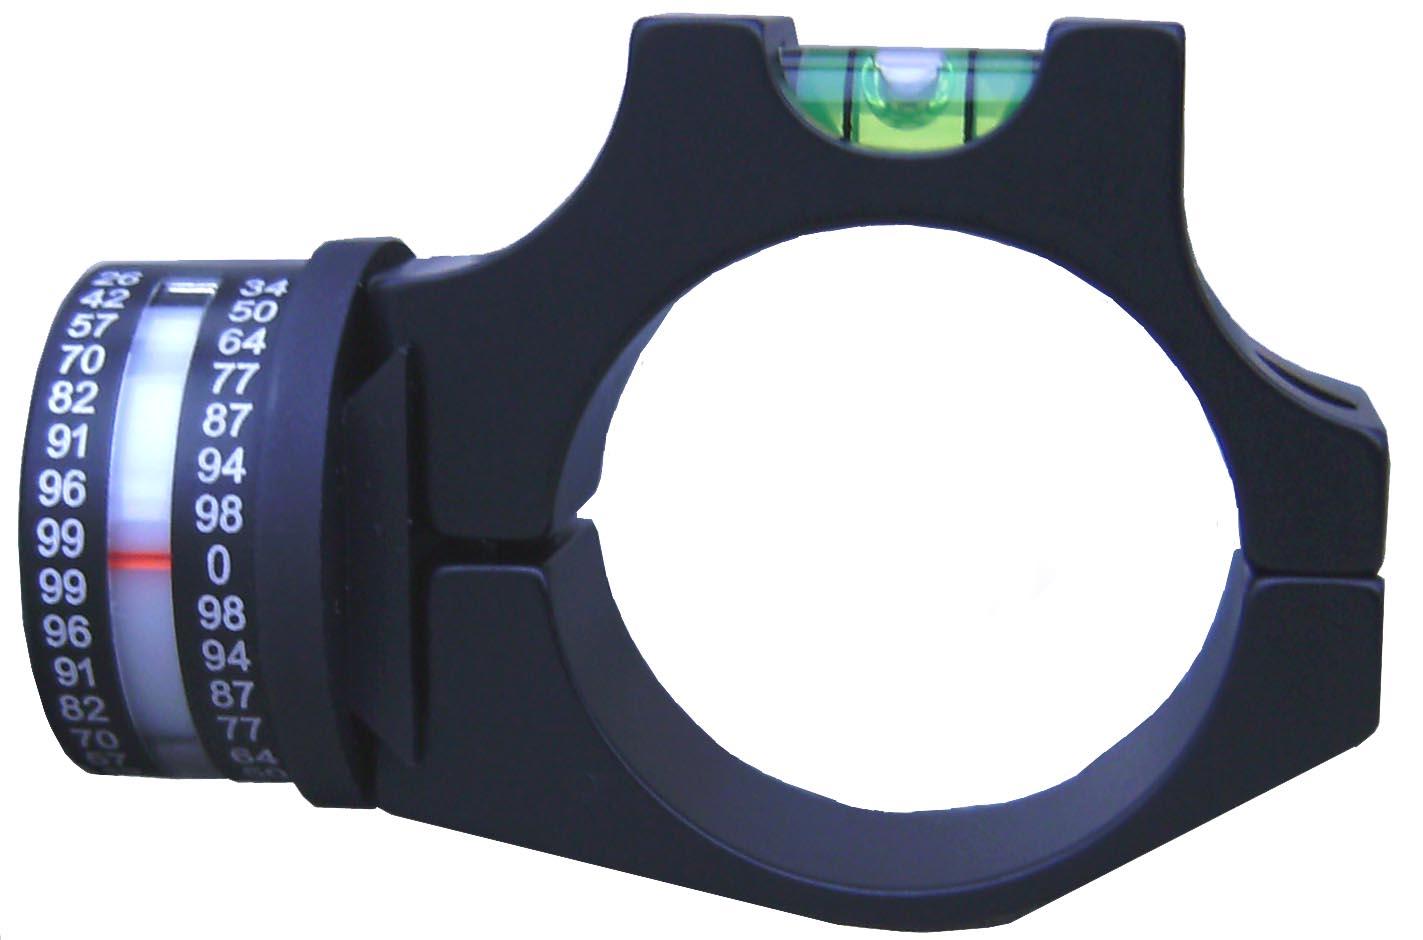 Laser Entfernungsmesser Picatinny : Visionking cs winkel höhe mt laser distanzmessgerät jagd